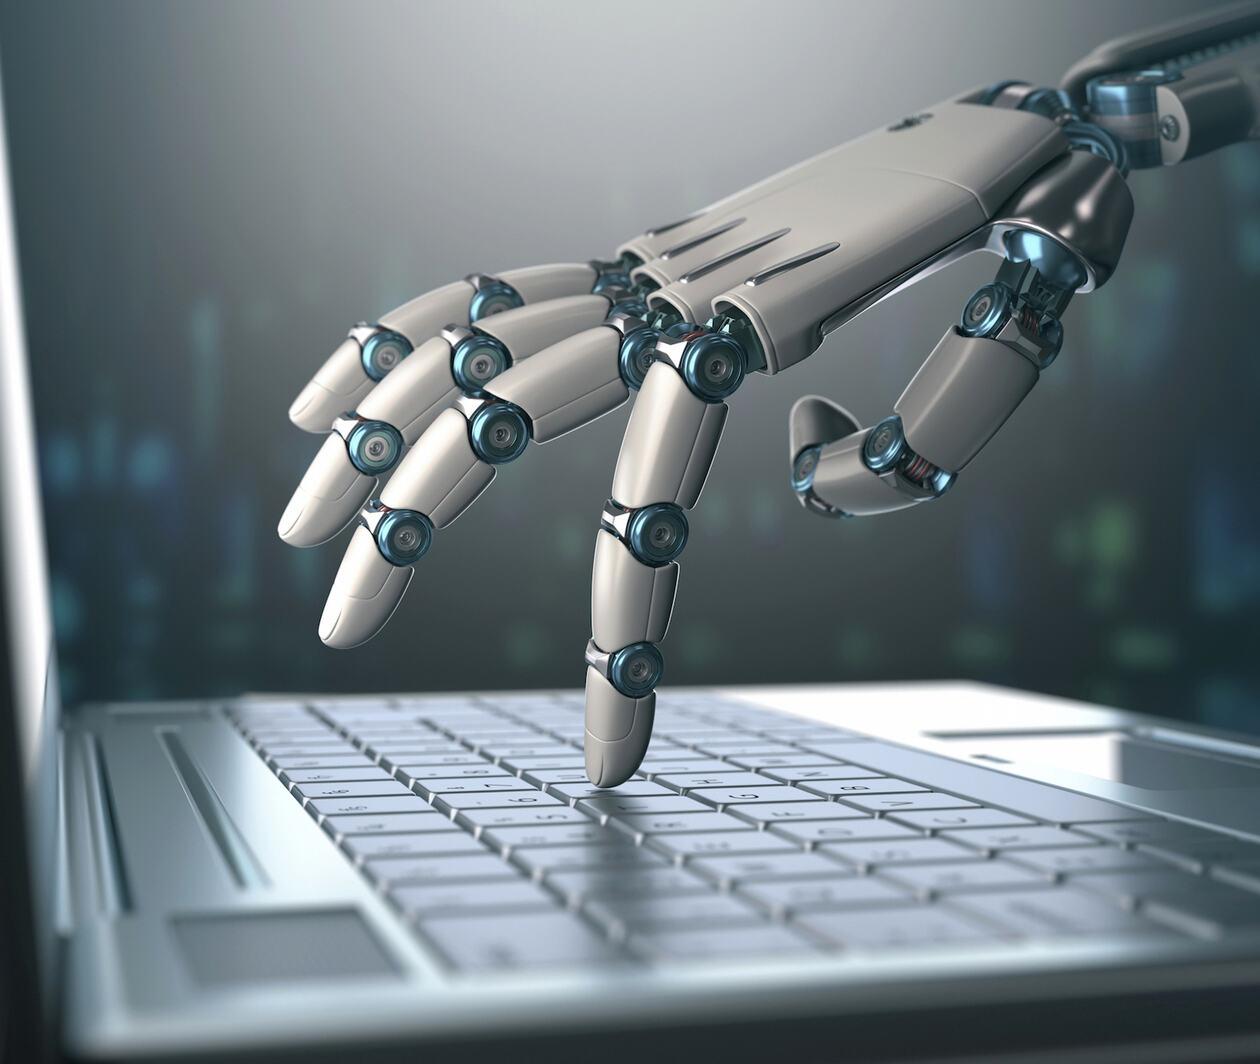 SIT740.4: Artificial Intelligence (AI) and Robotics R&D